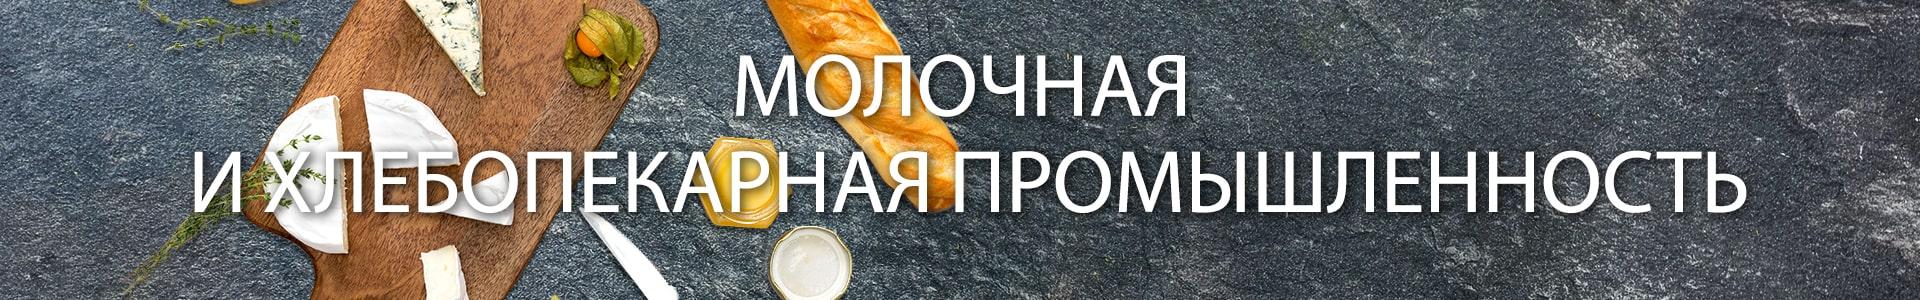 Pekny-Unimex-Prumysl-Молочная